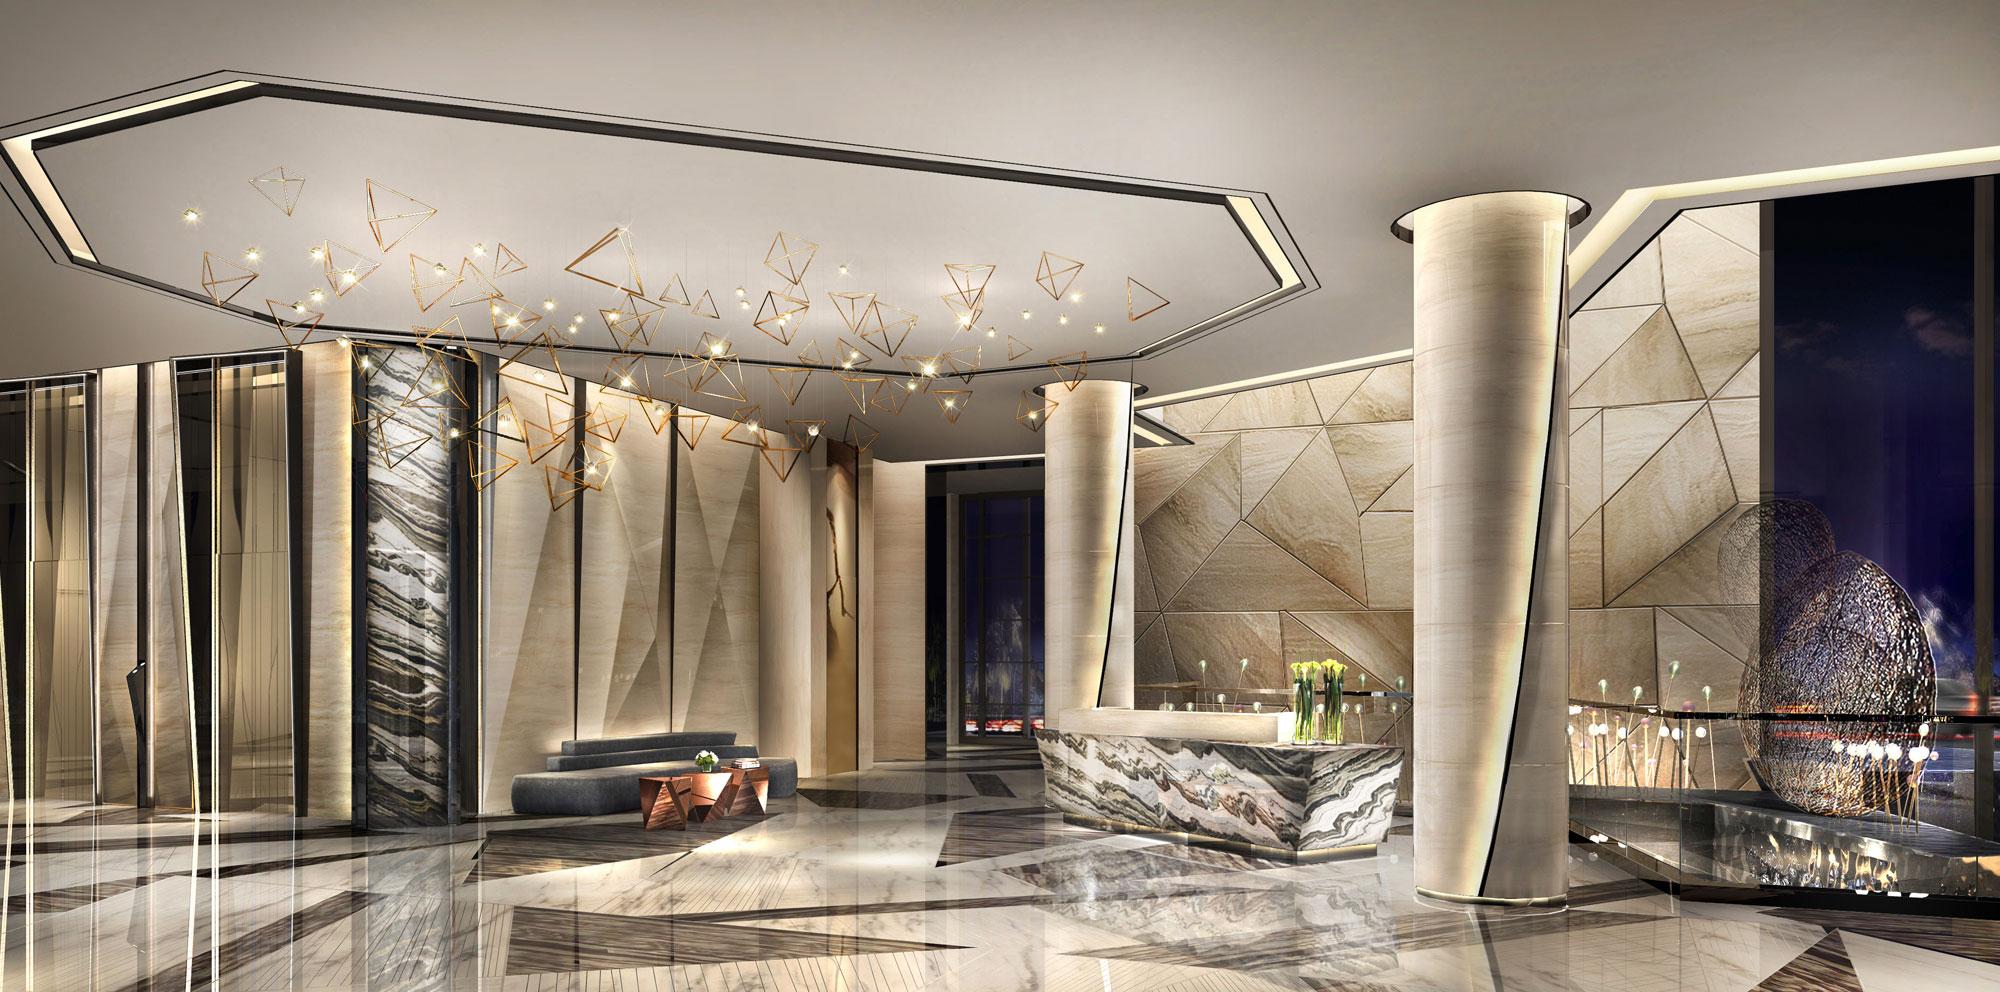 Fairmont Designs Bedroom Furniture Hydra Modern Bed Sets